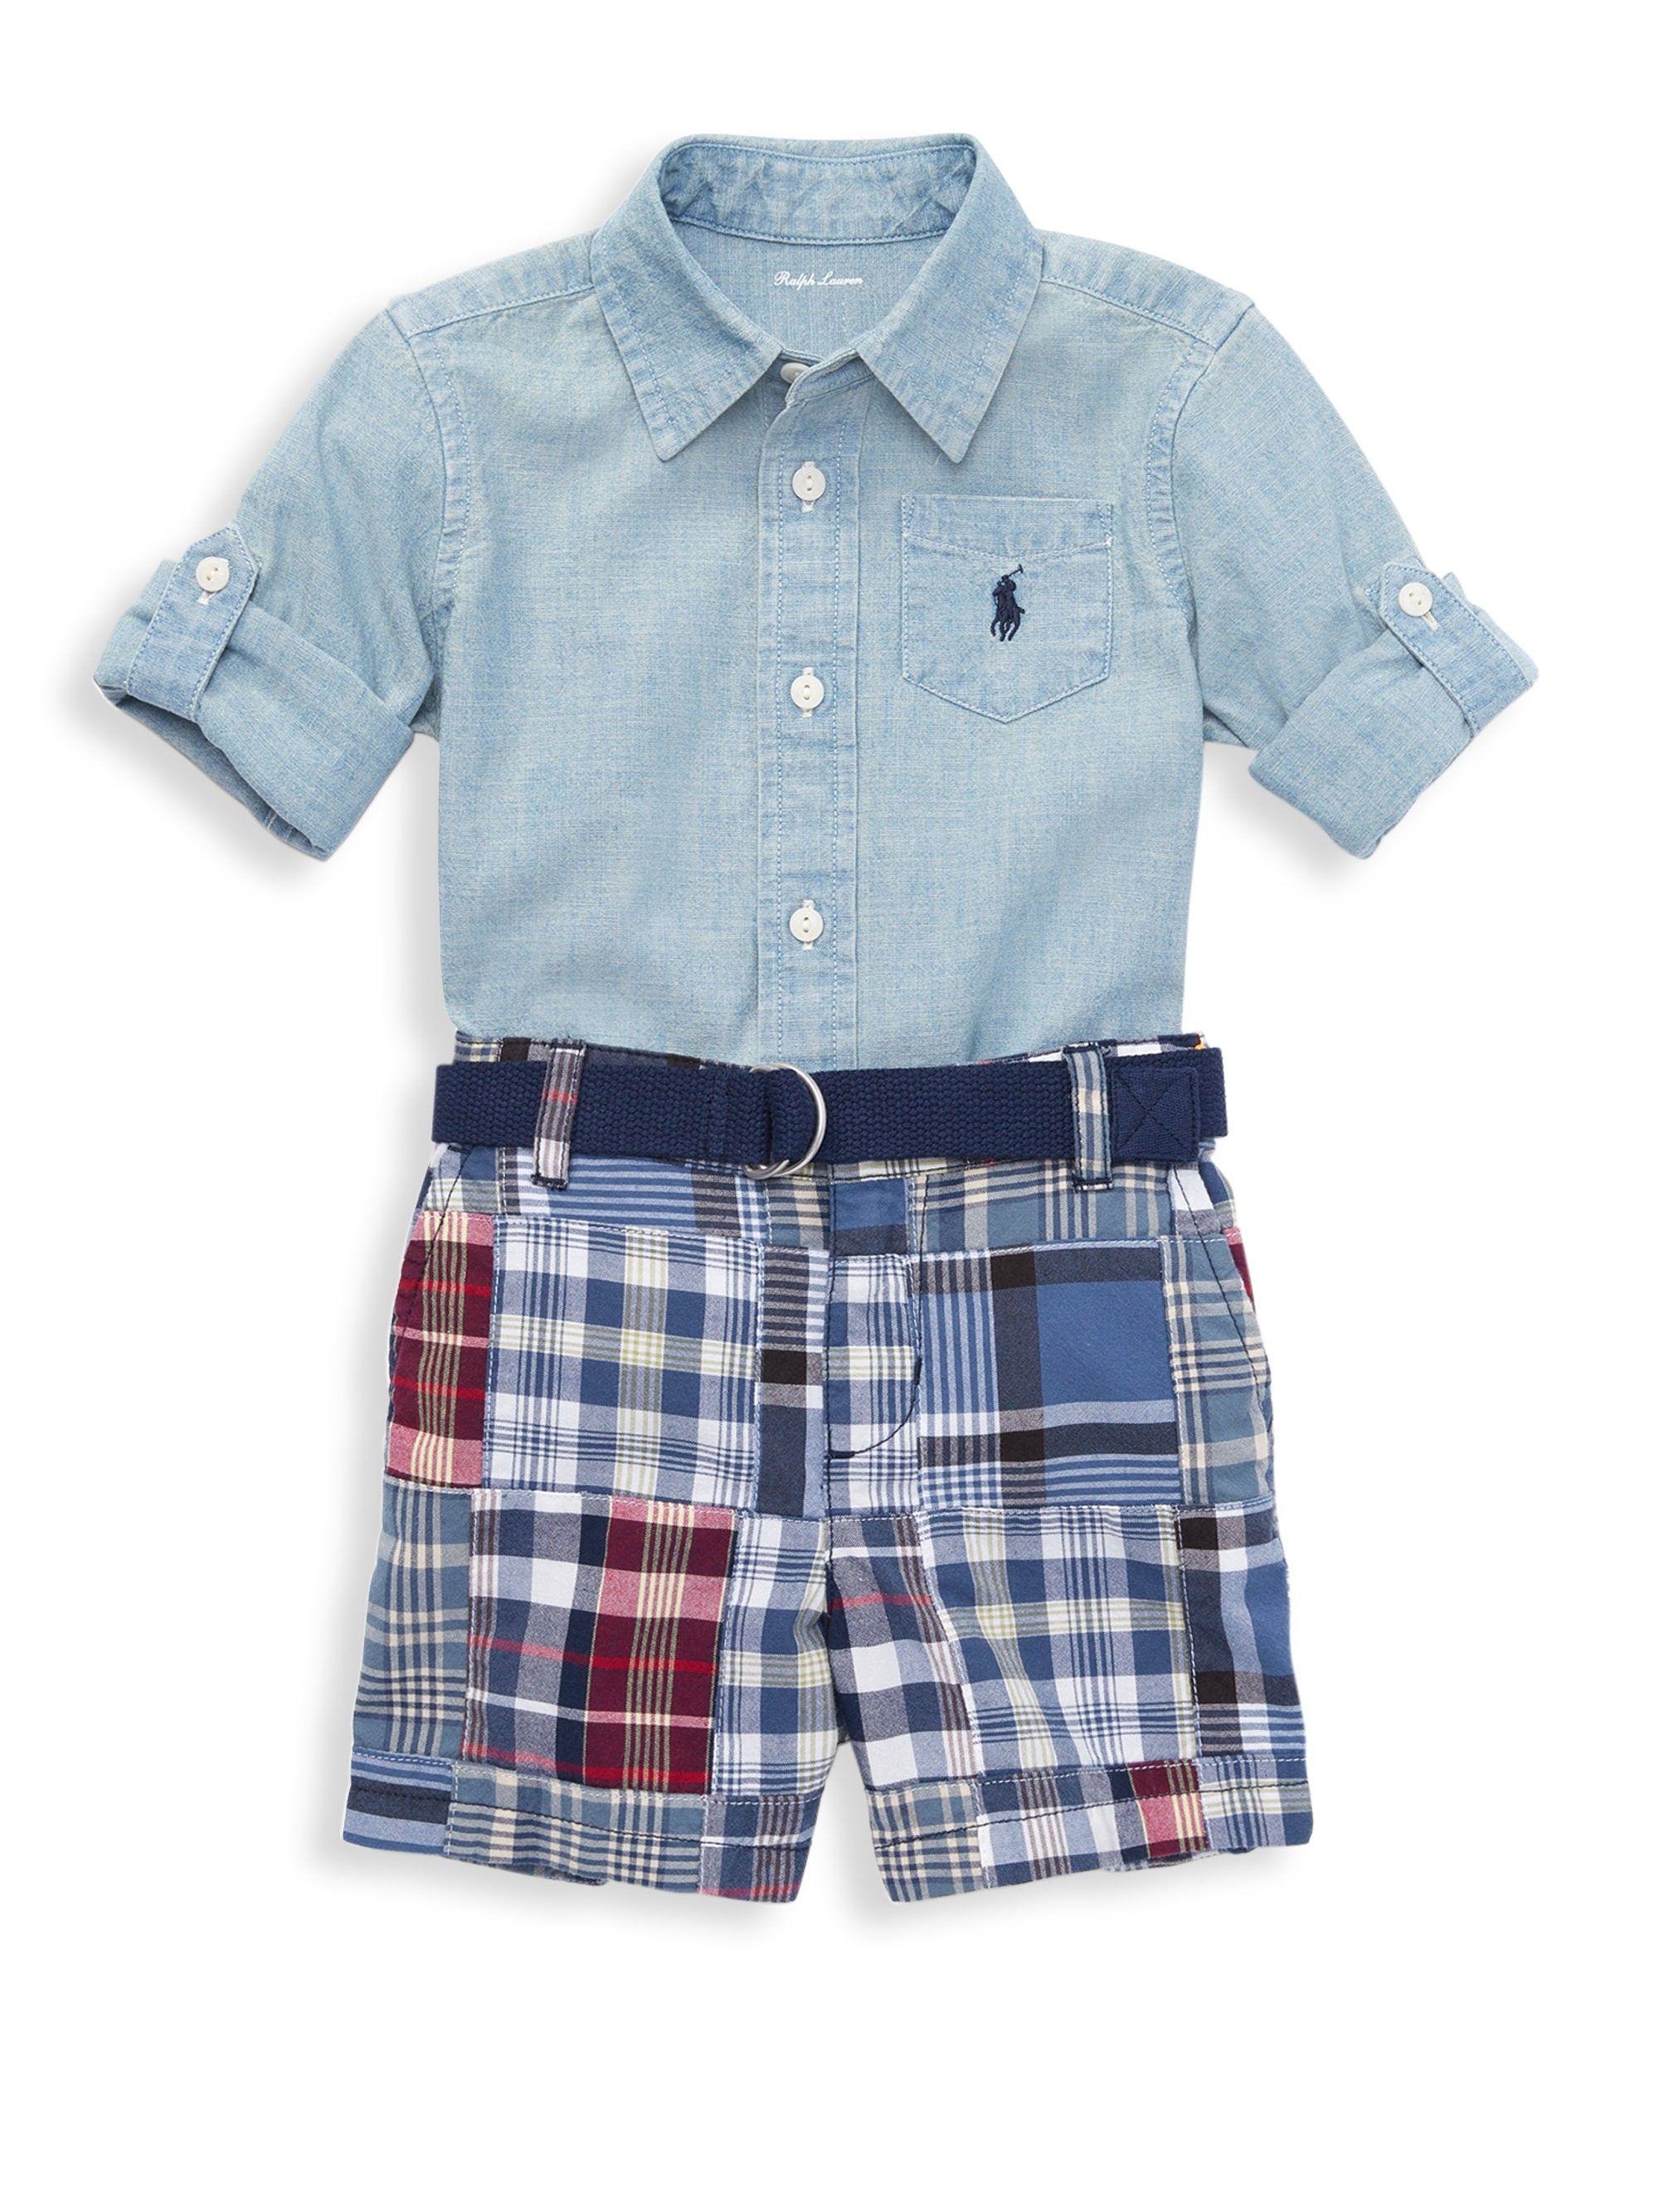 c79cbf895 Ralph Lauren Baby Boy s Two-Piece Cotton Collared Shirt And Madras Plaid Shorts  Set - Blue 24 Months